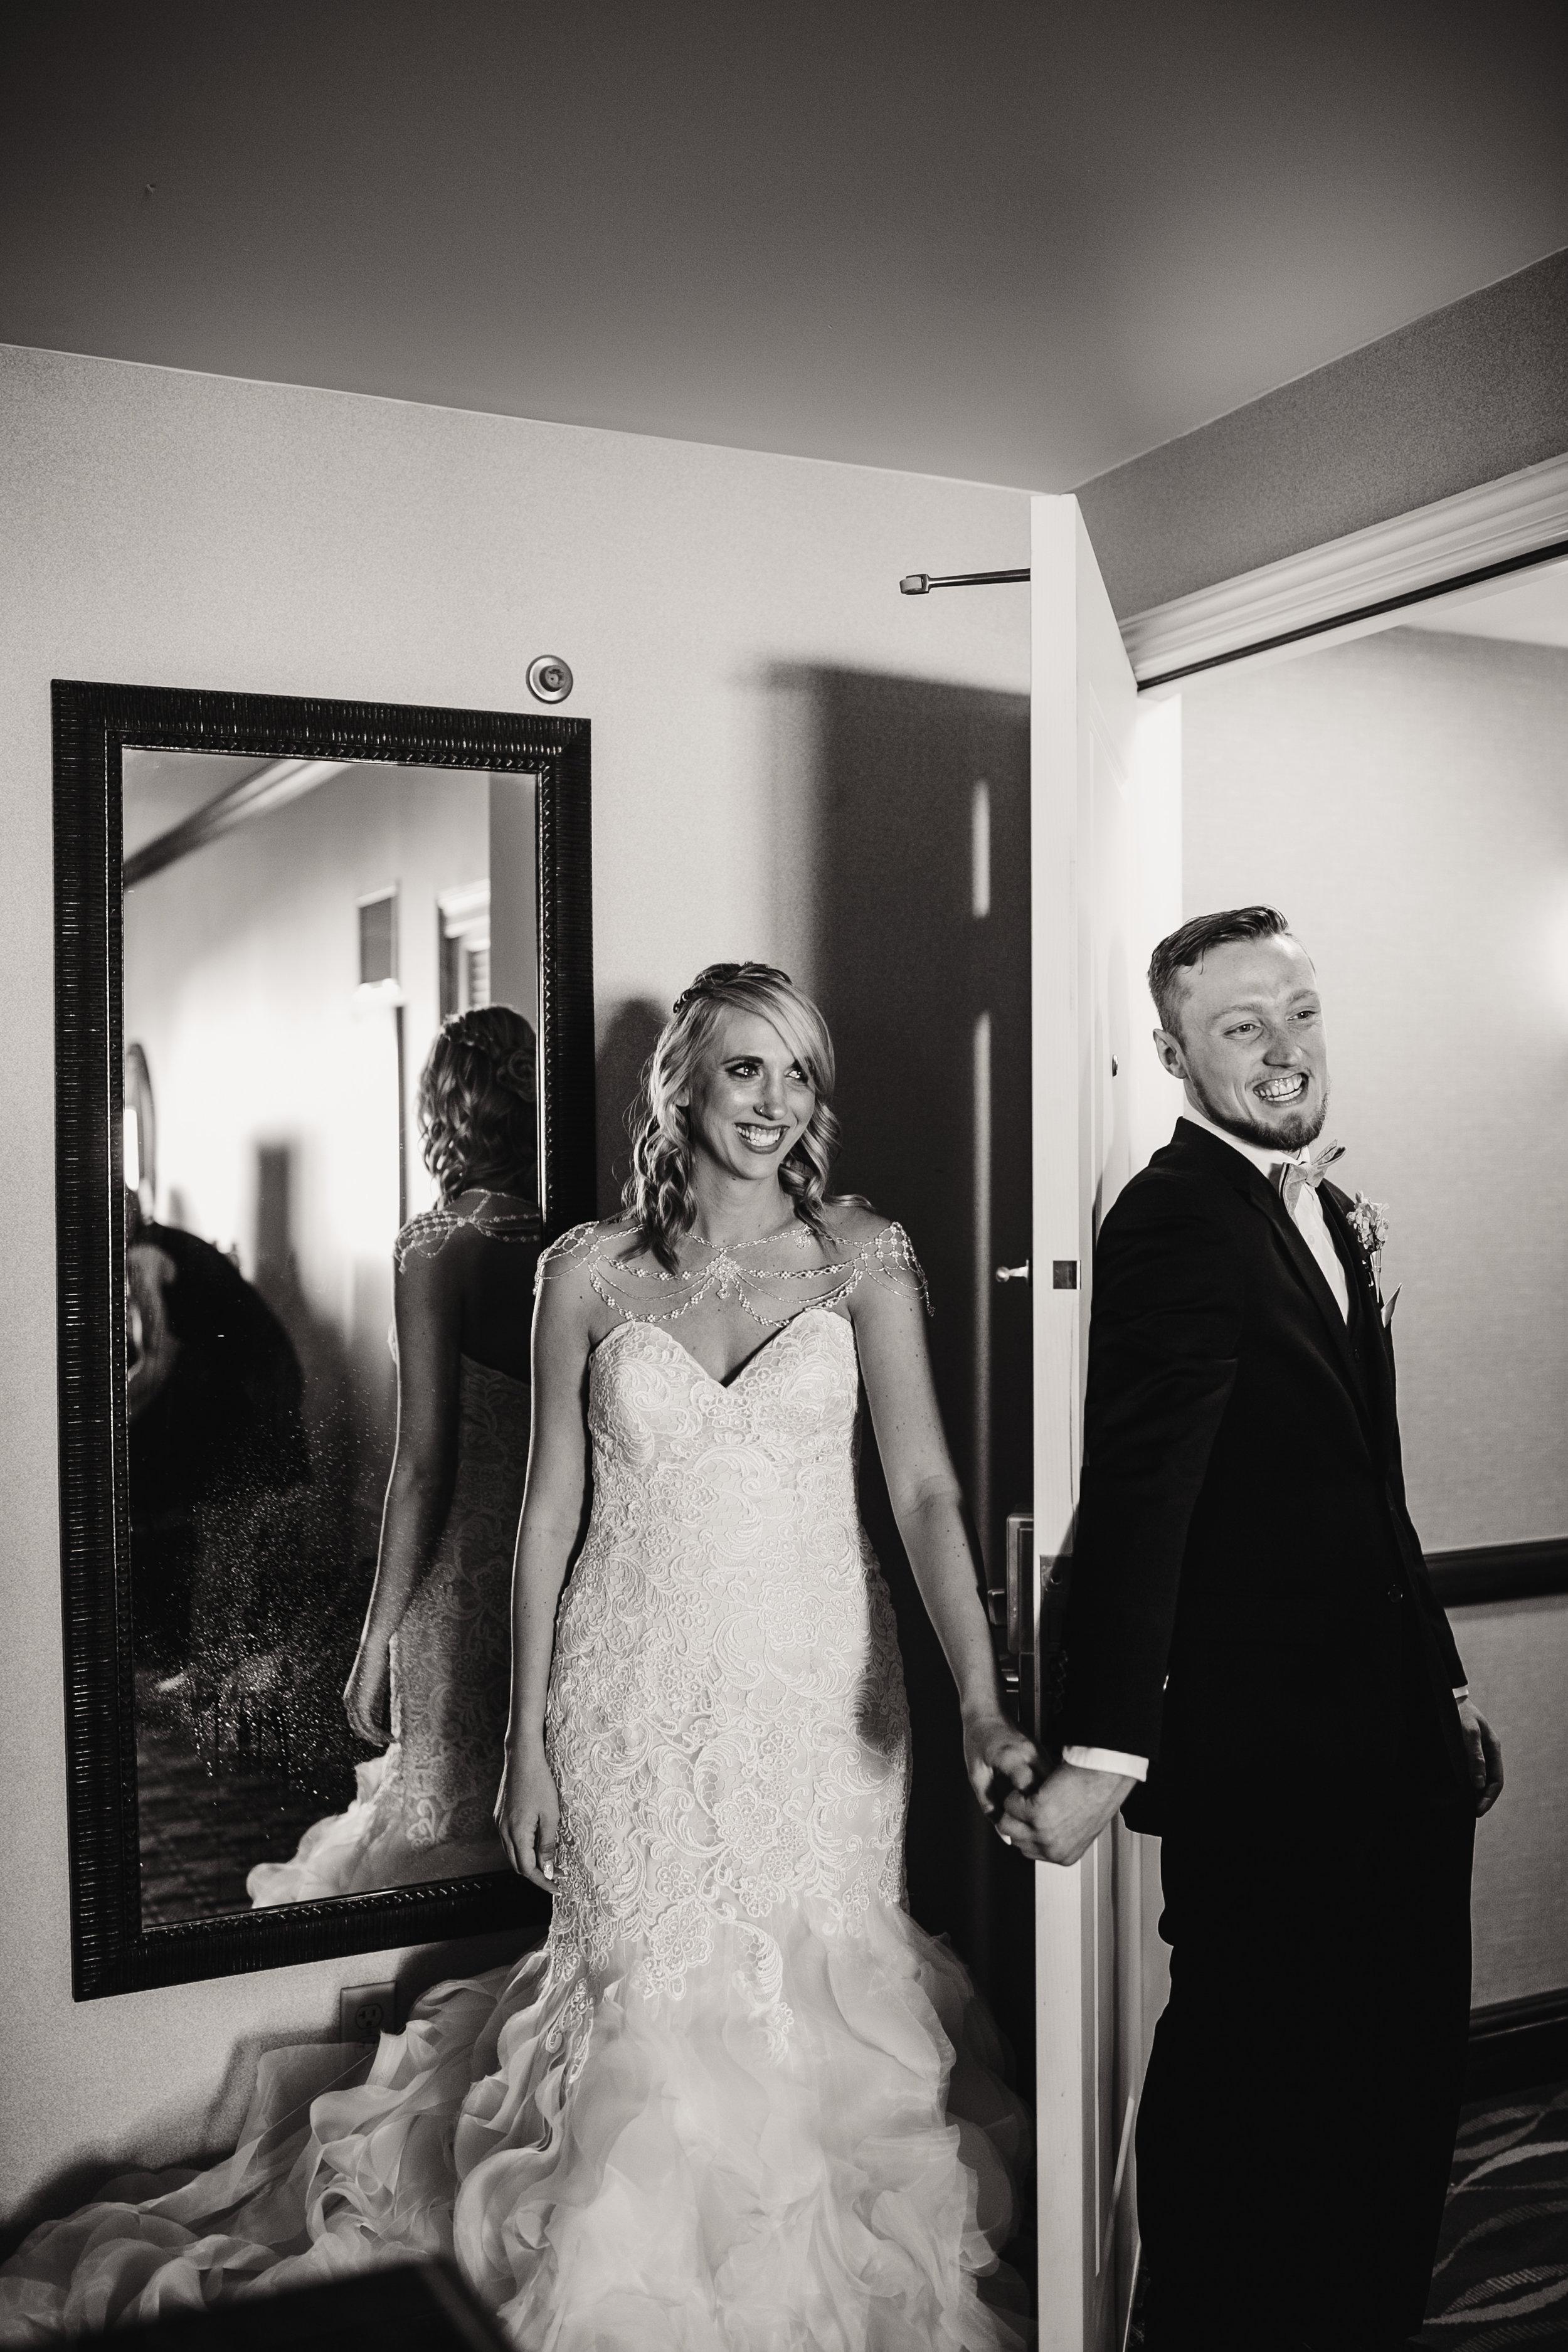 adventure-wedding-photographer-gracetphotography-15.jpg